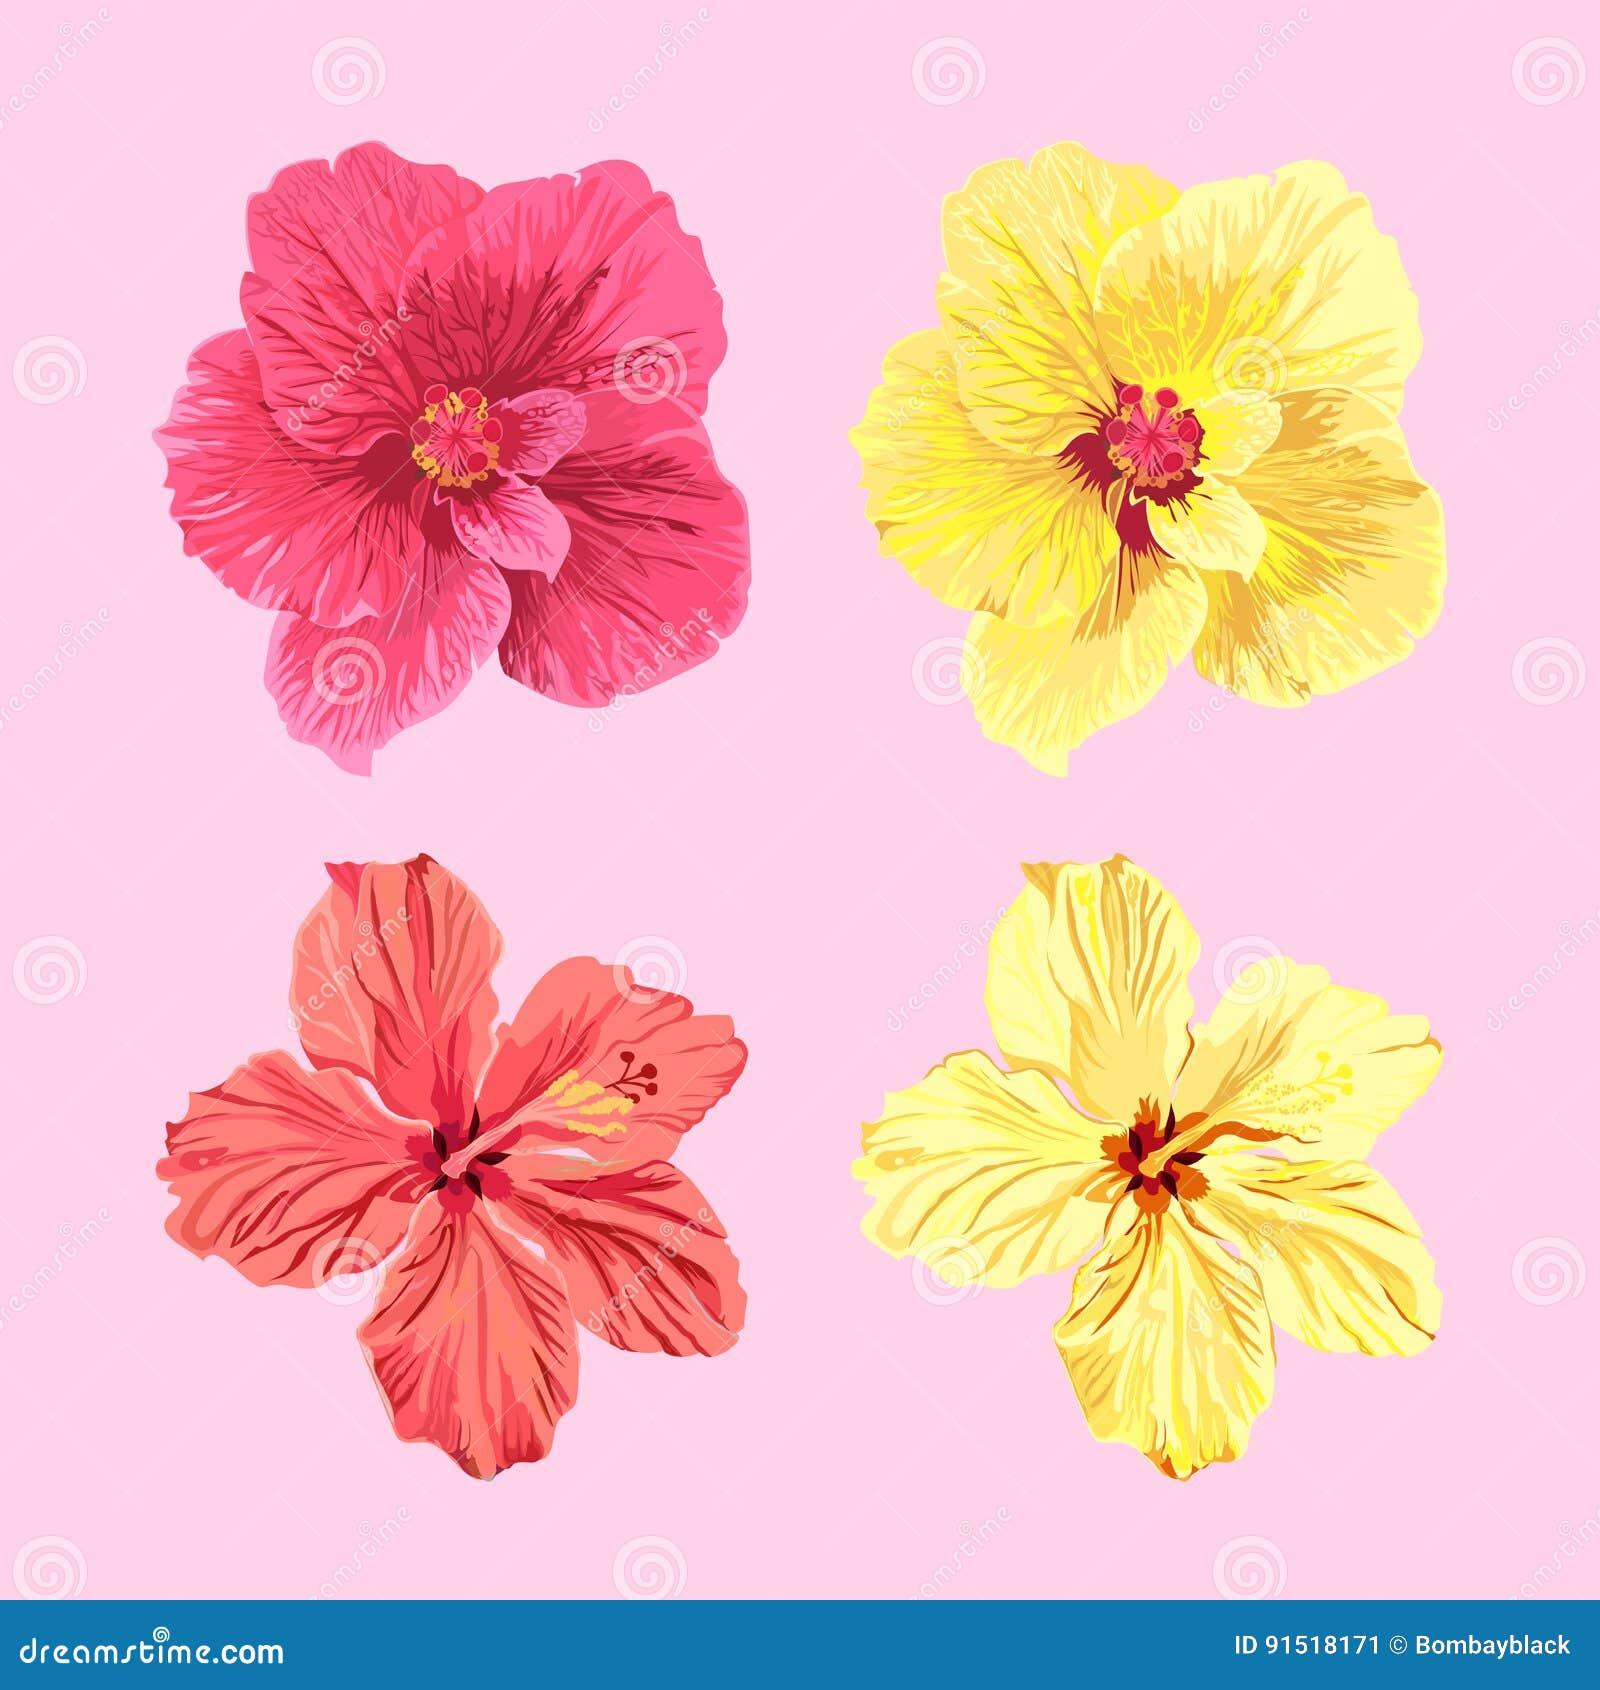 Jamaica flowers set stock illustration illustration of floral download jamaica flowers set stock illustration illustration of floral 91518171 izmirmasajfo